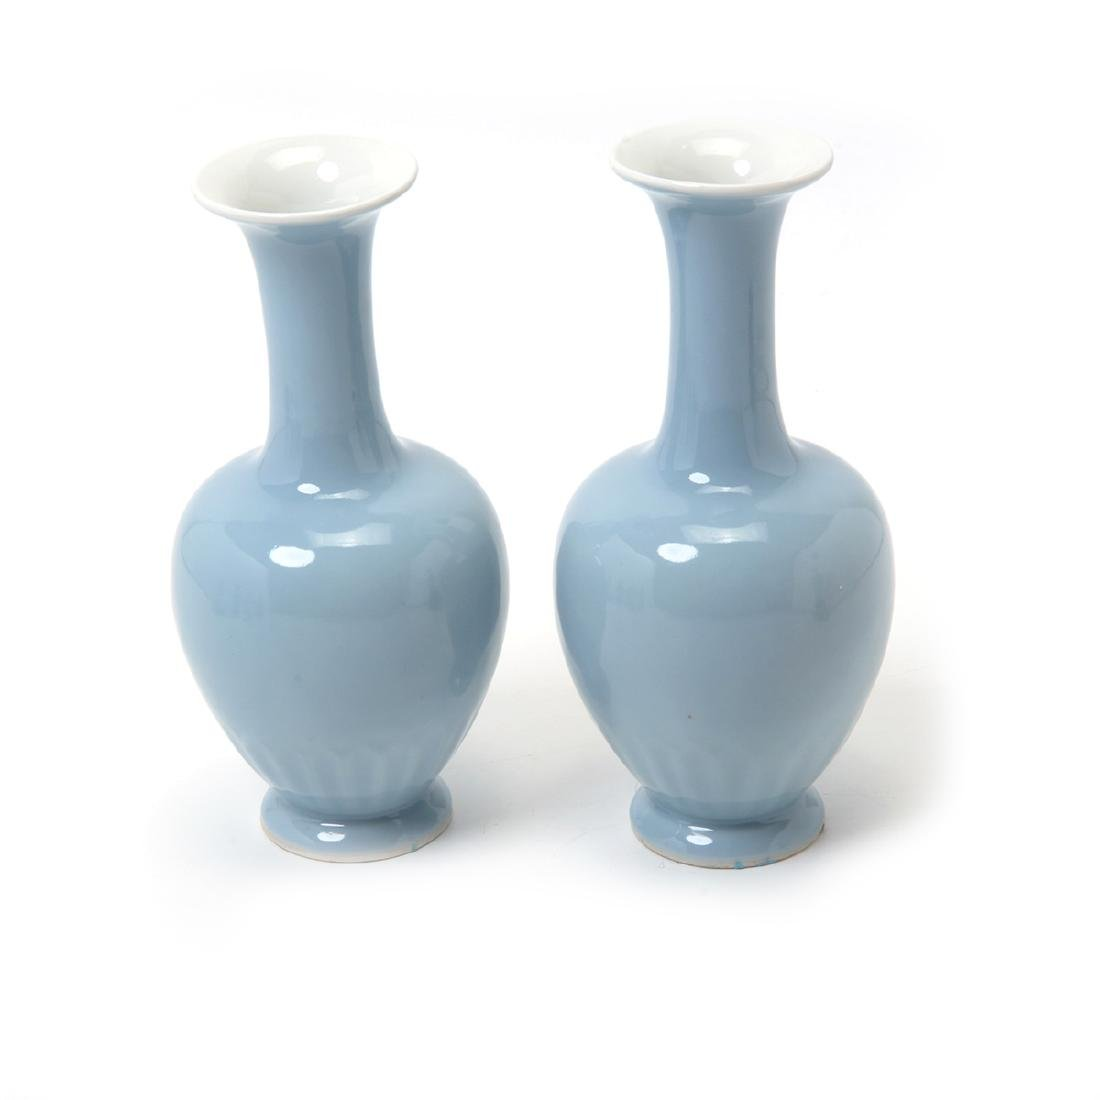 Seven Clair-de-Lune Glazed Vases, 19th Century - 2